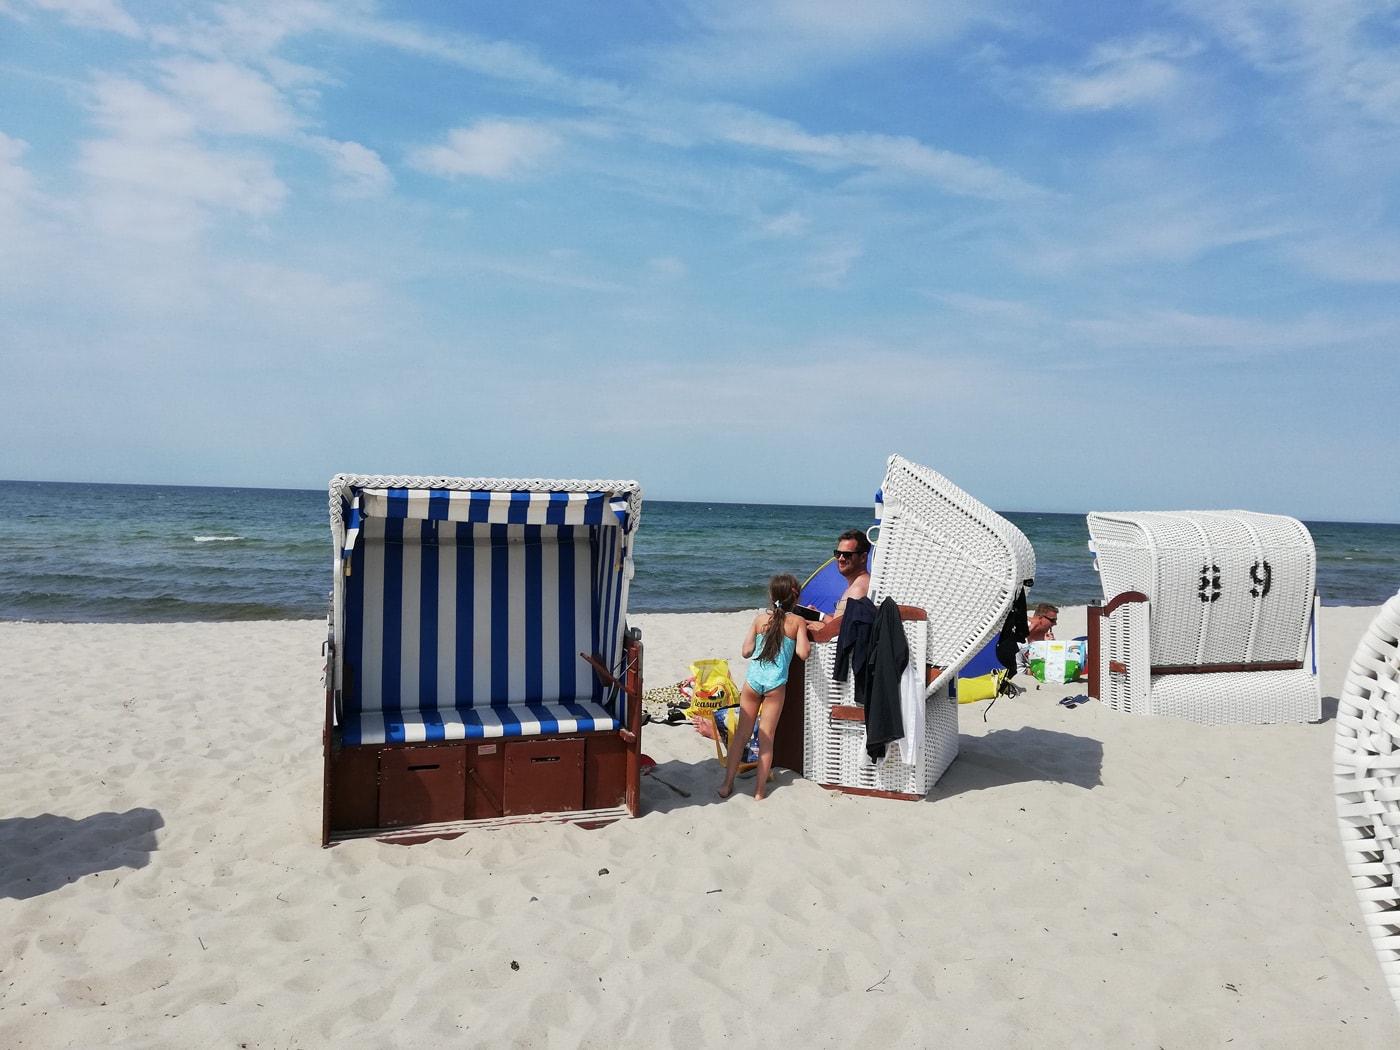 Sandstrand und Strandkoerbe